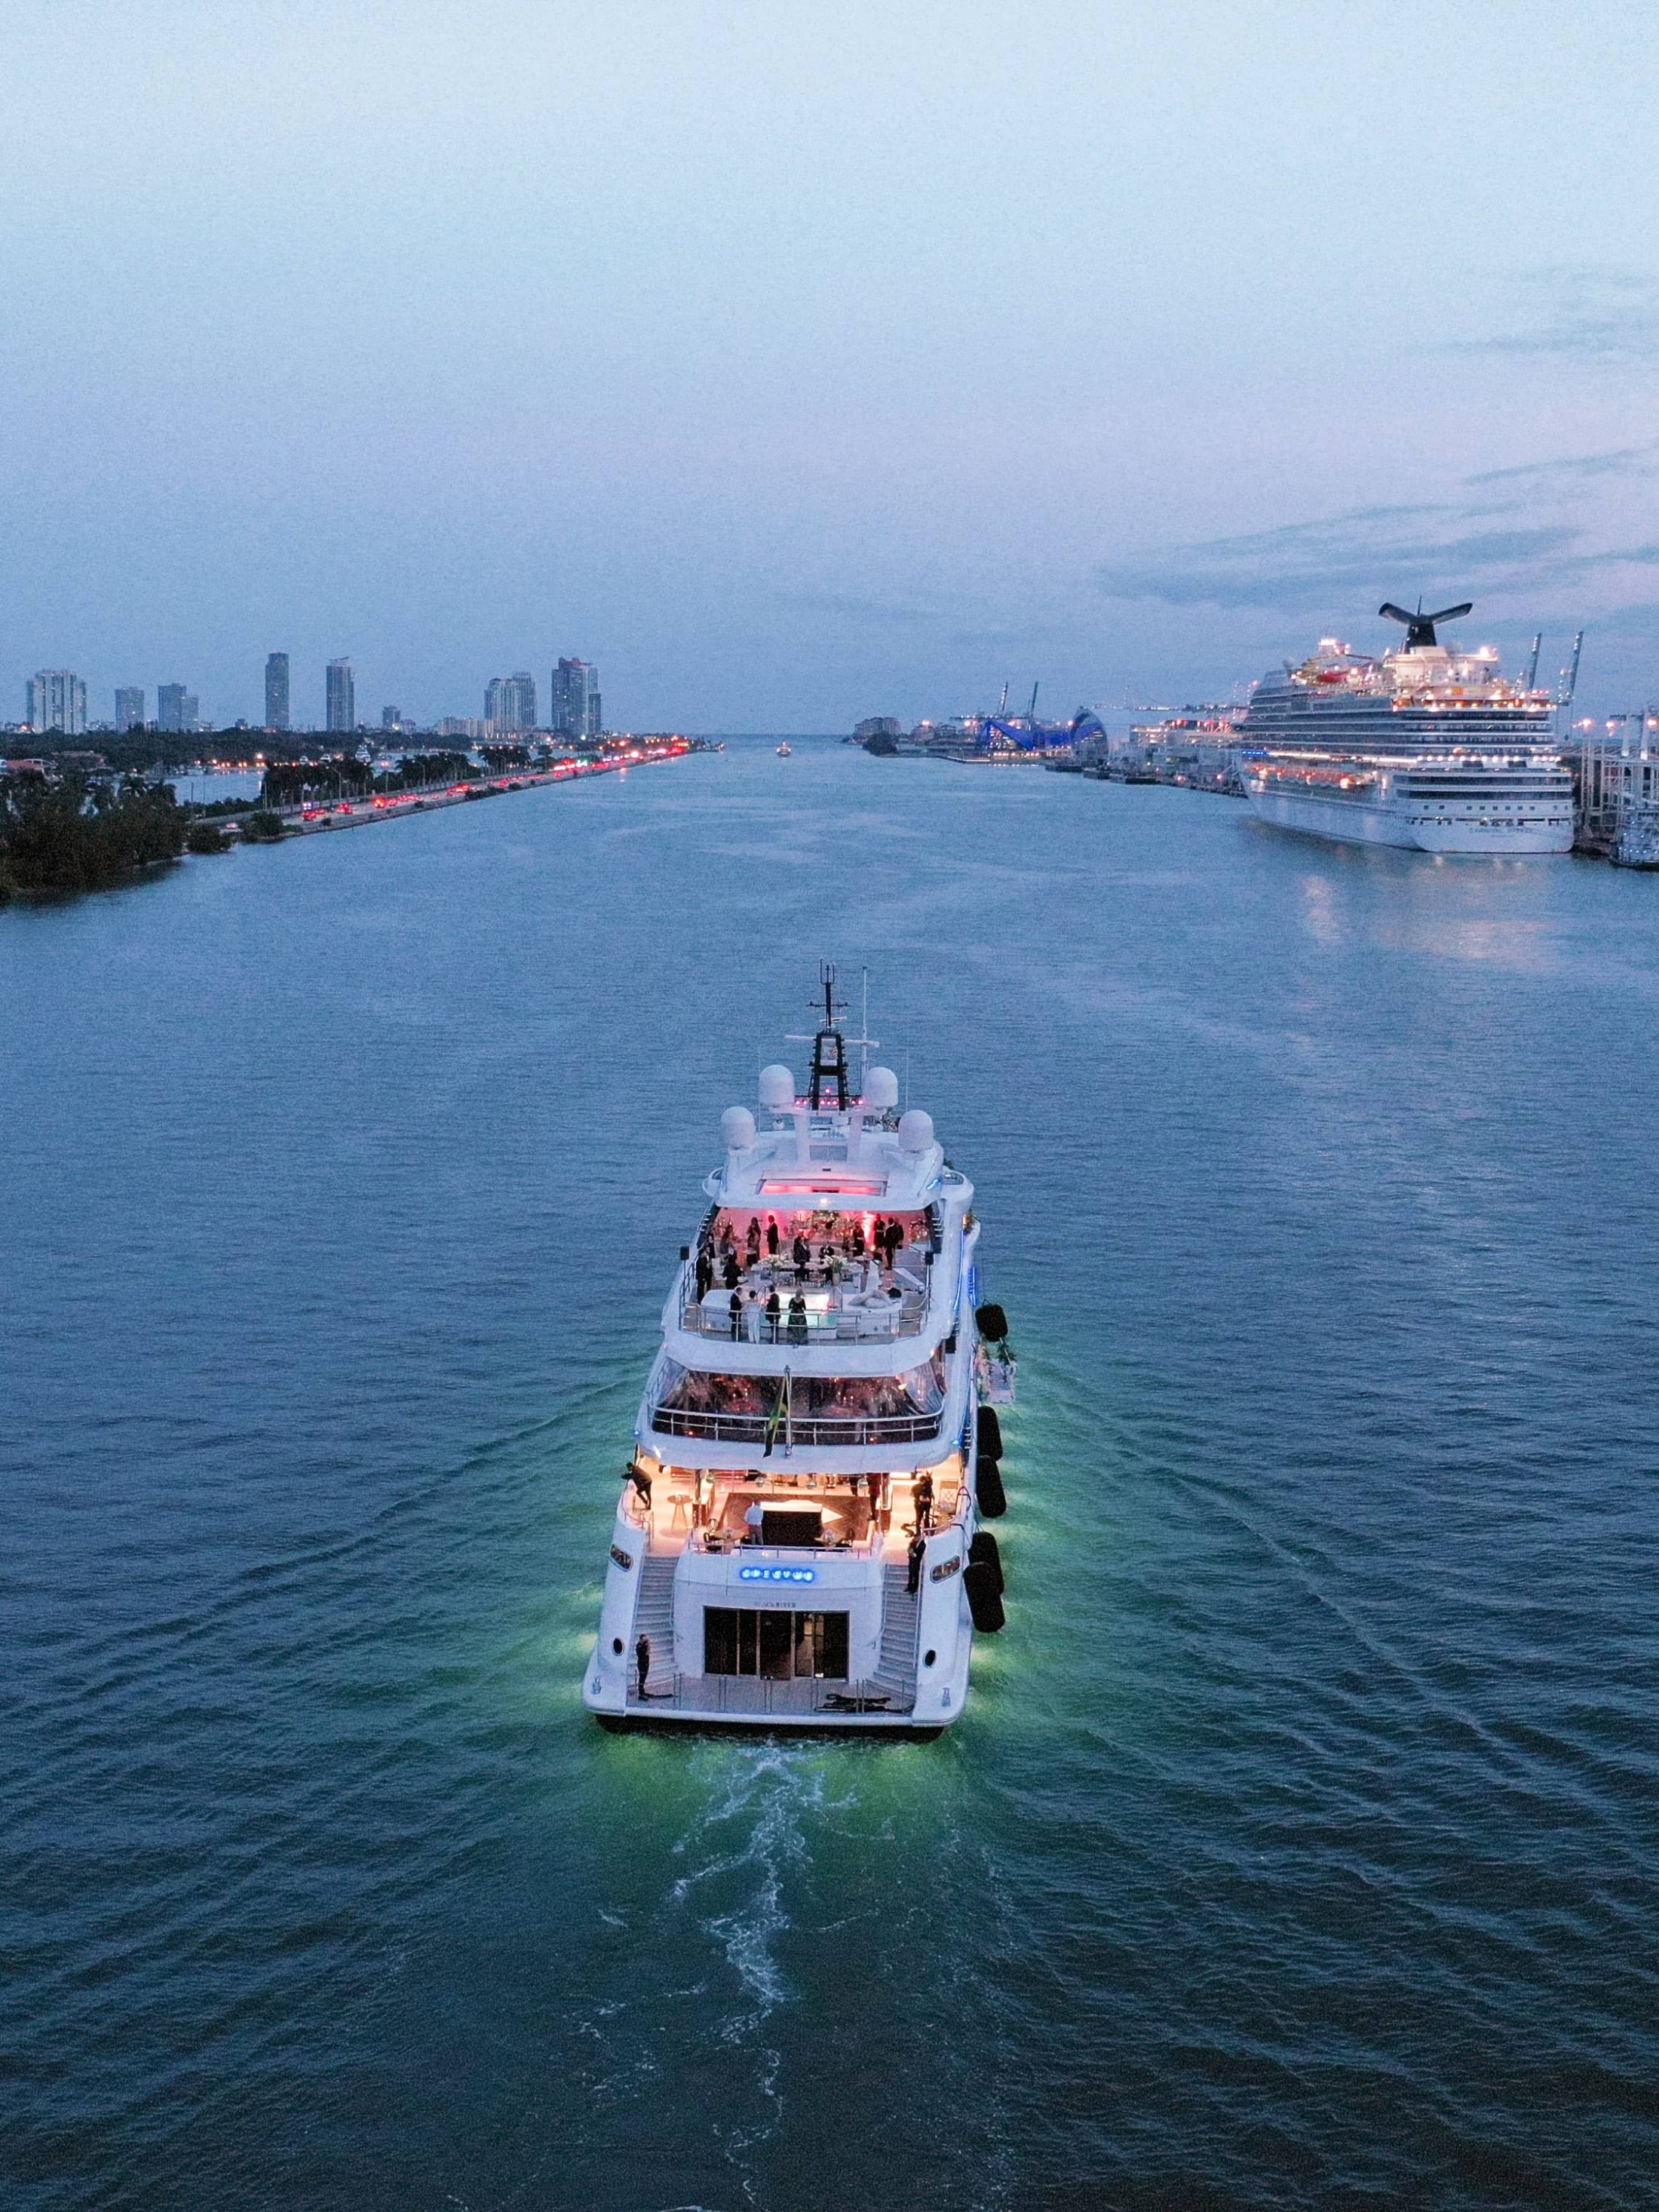 Cruising Miami at this Miami yacht wedding | Photo by Corbin Gurkin